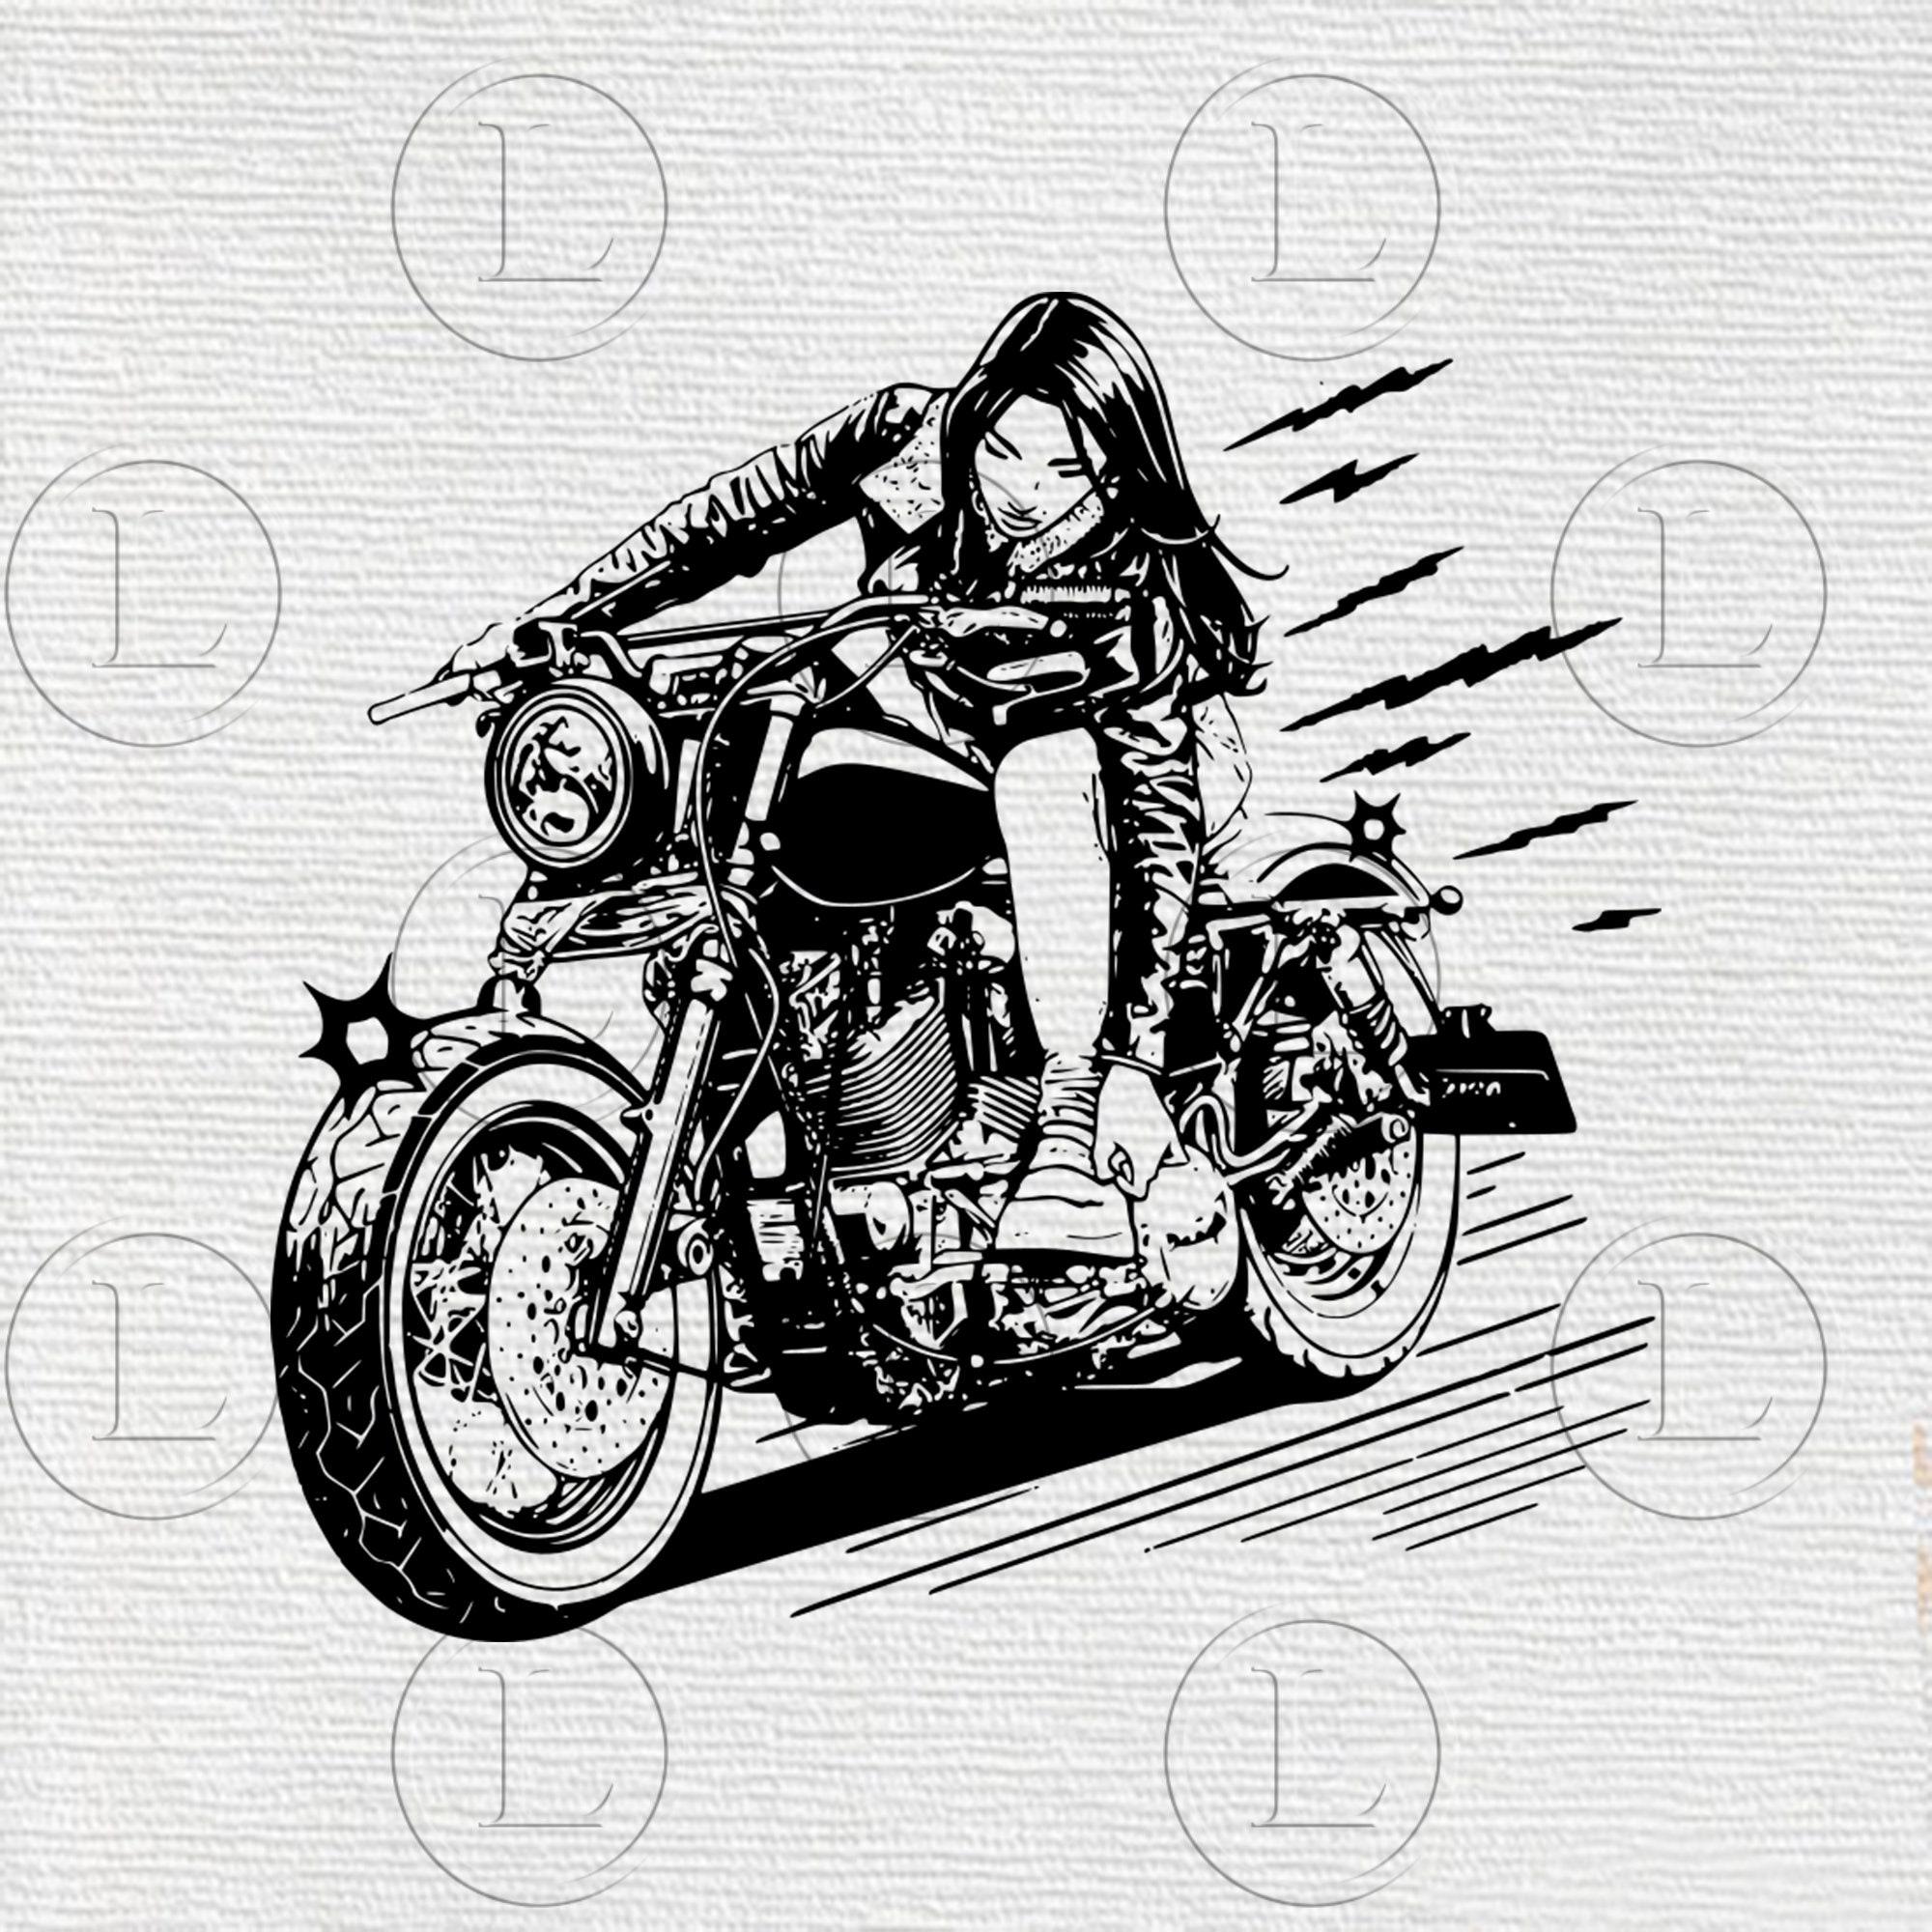 Biker chick pics Biker Girl Svg Biker Chick Svg Women On Motorcycles Png Women Etsy